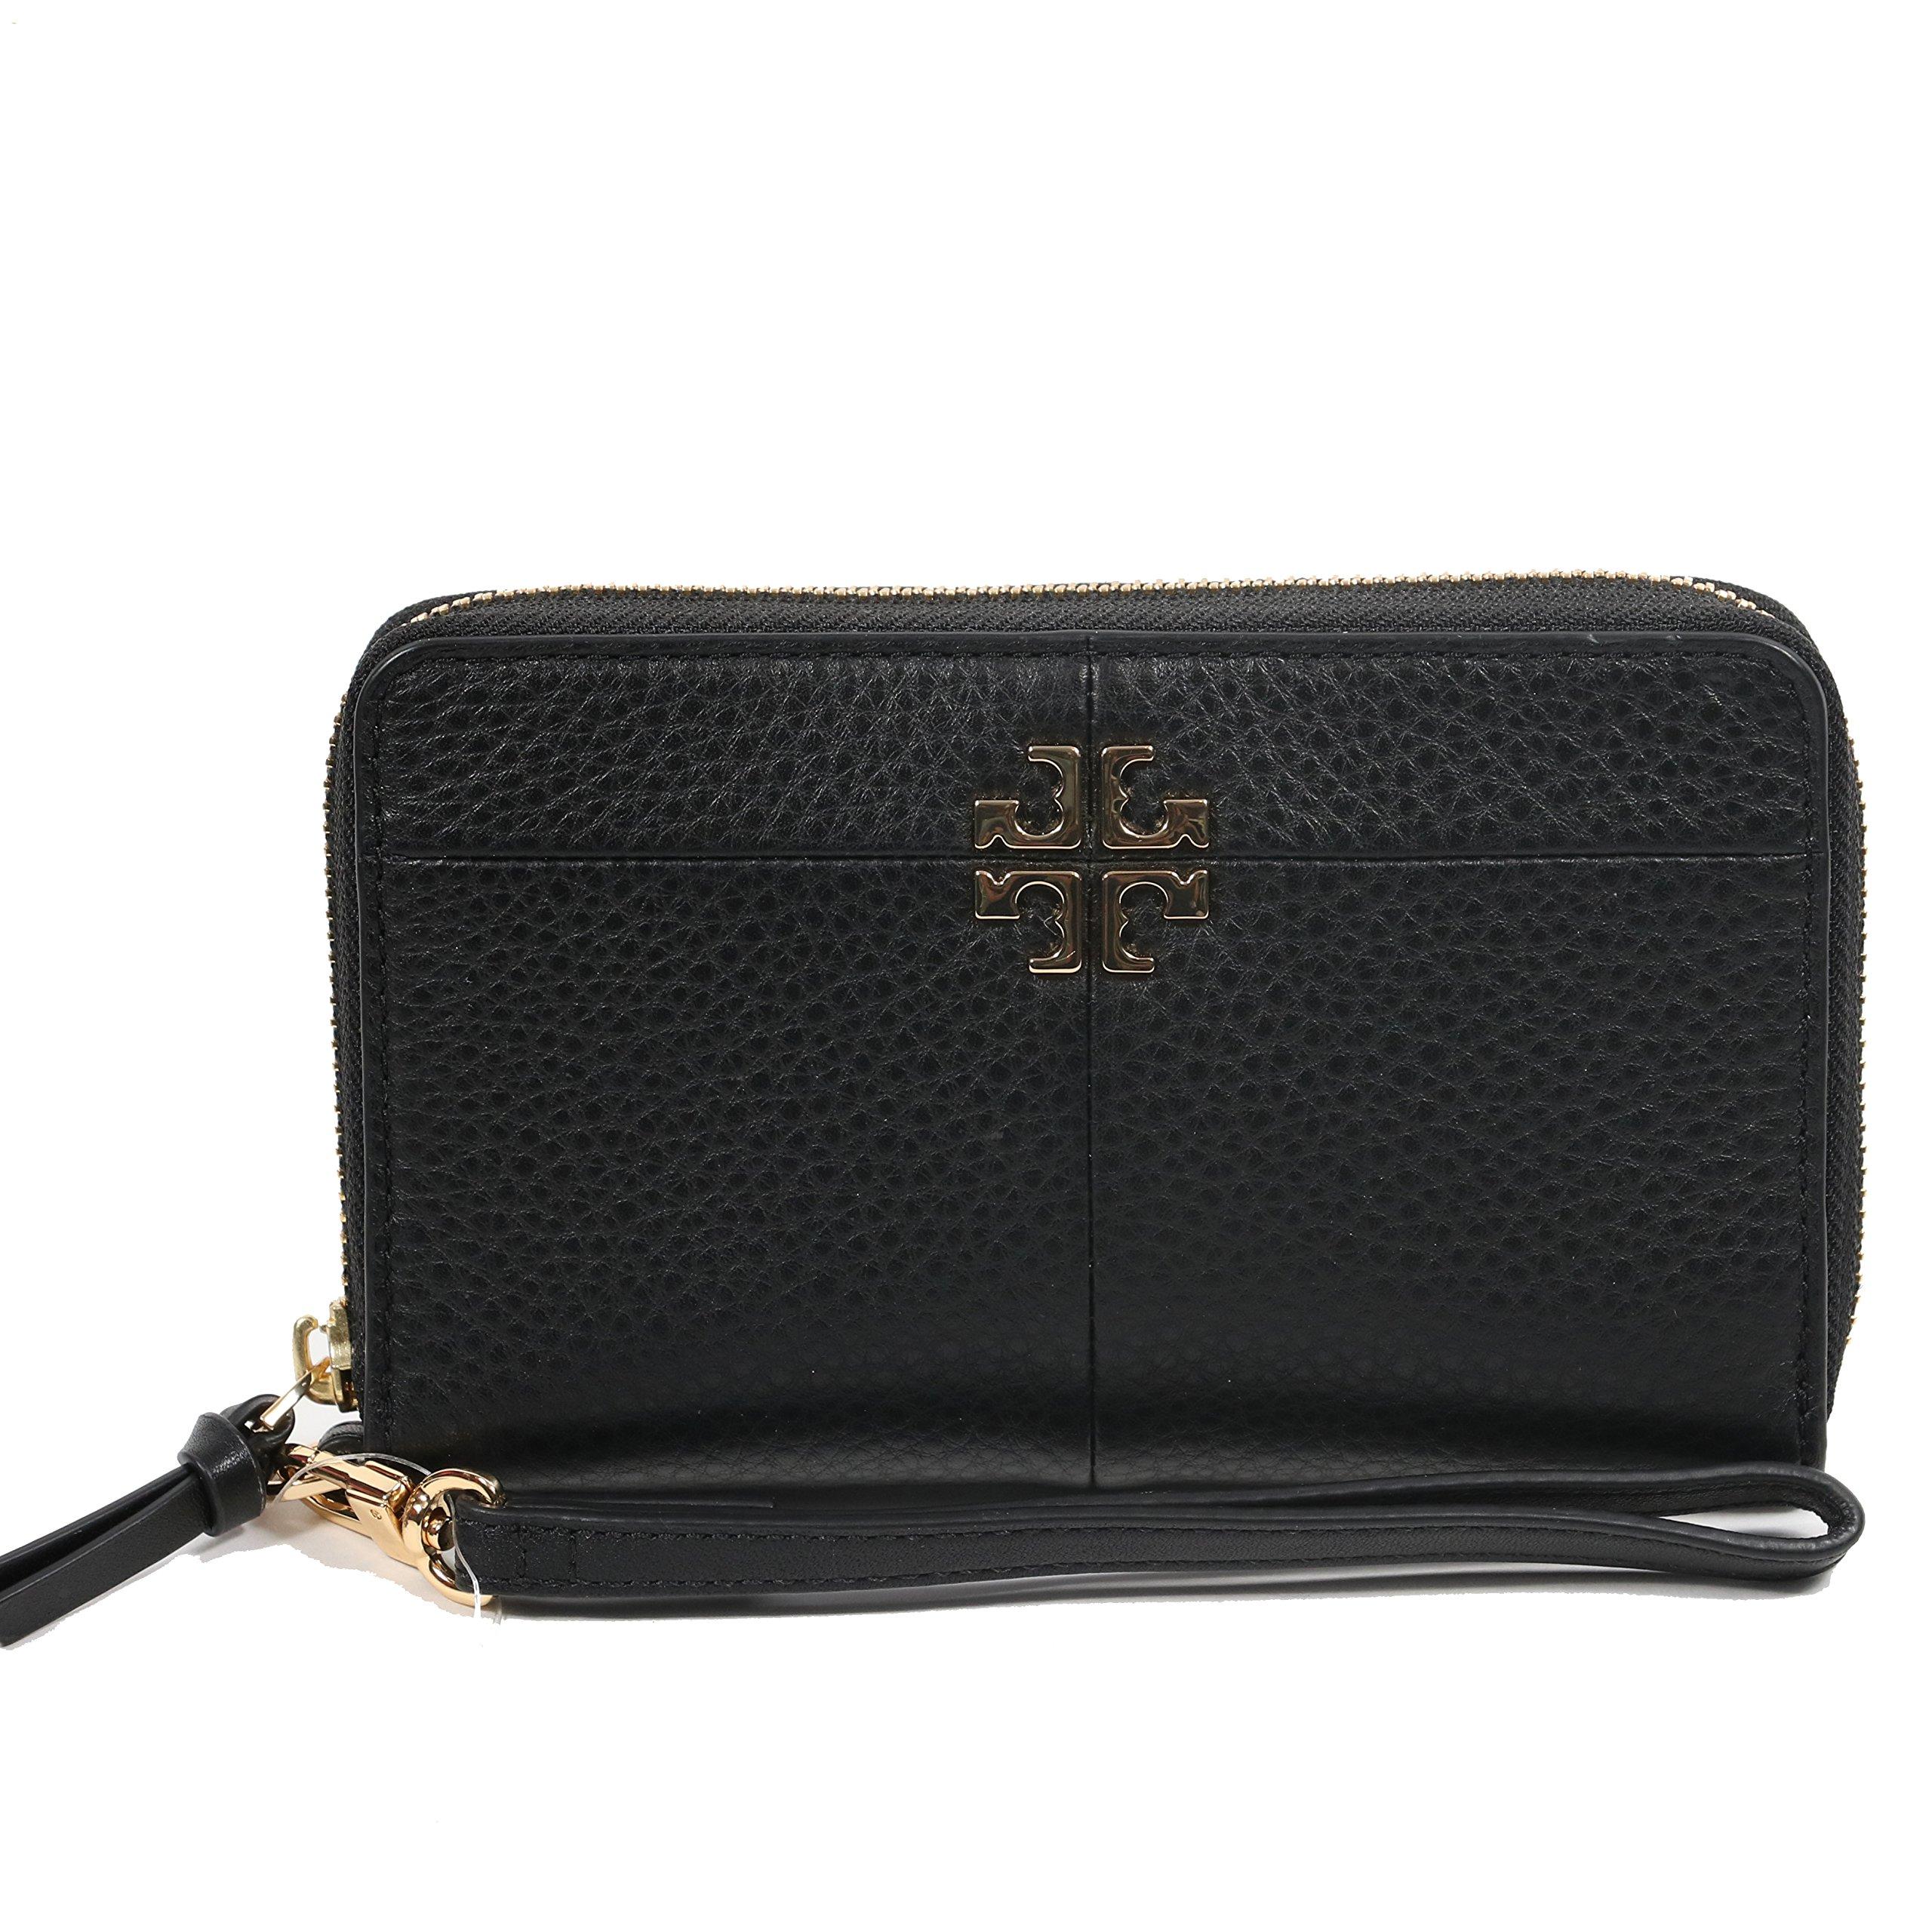 Tory Burch Wallet Wristlet Ivy Smartphone (Black)